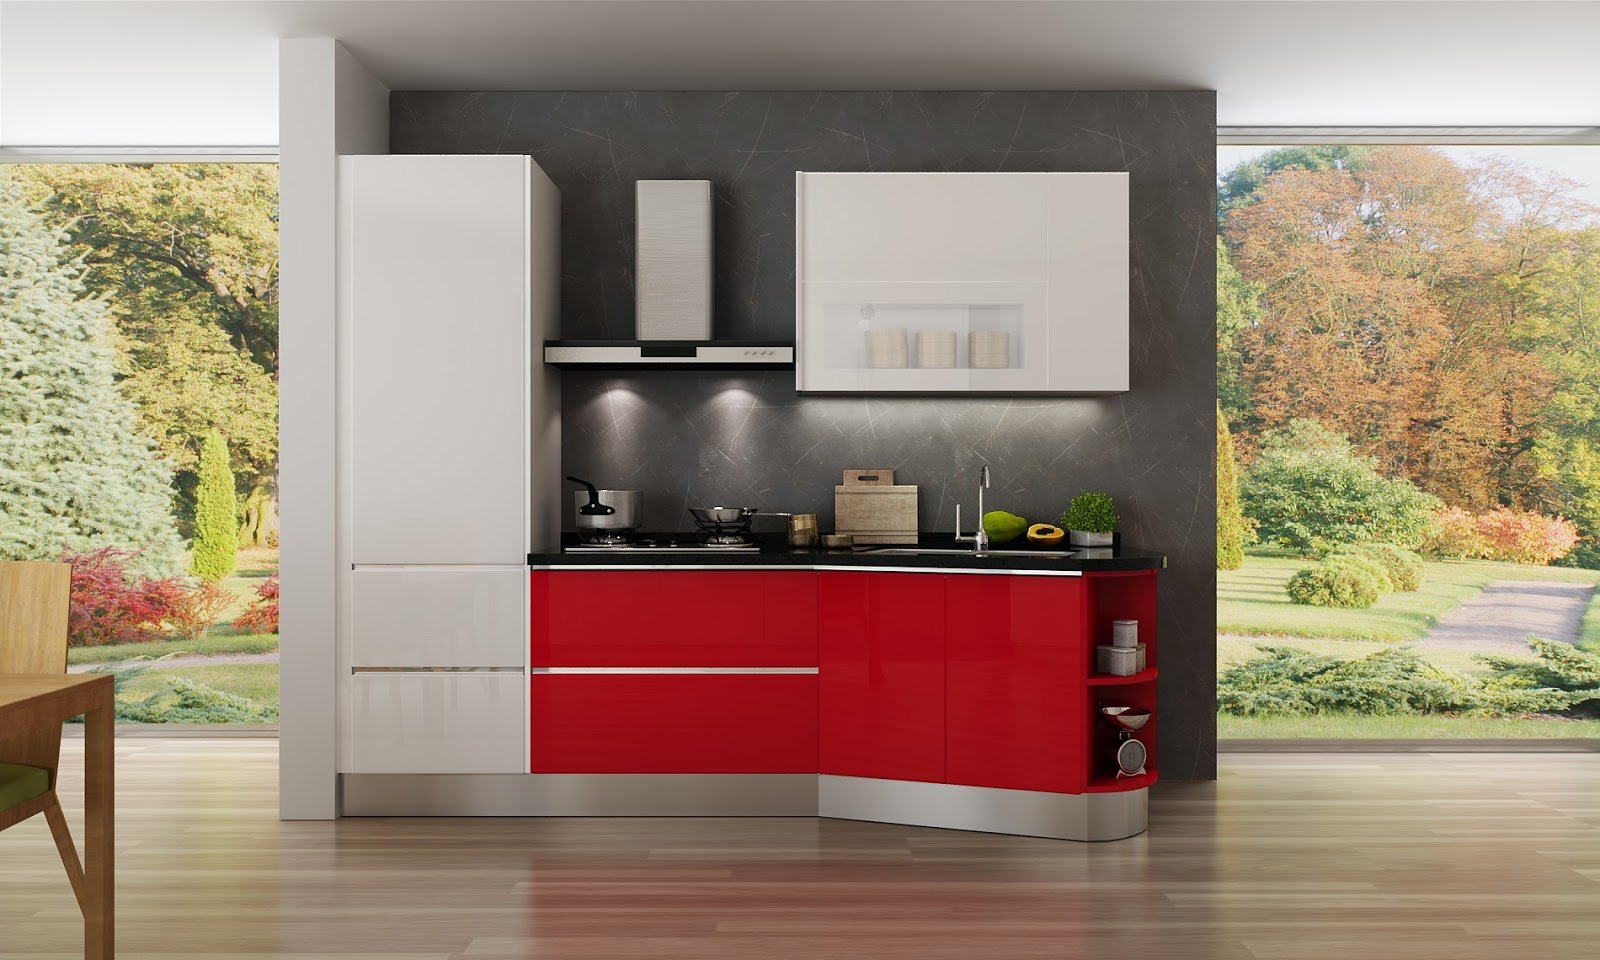 Oppein Kitchen Cabinet In 18th Buildexpo Tanzania 2015